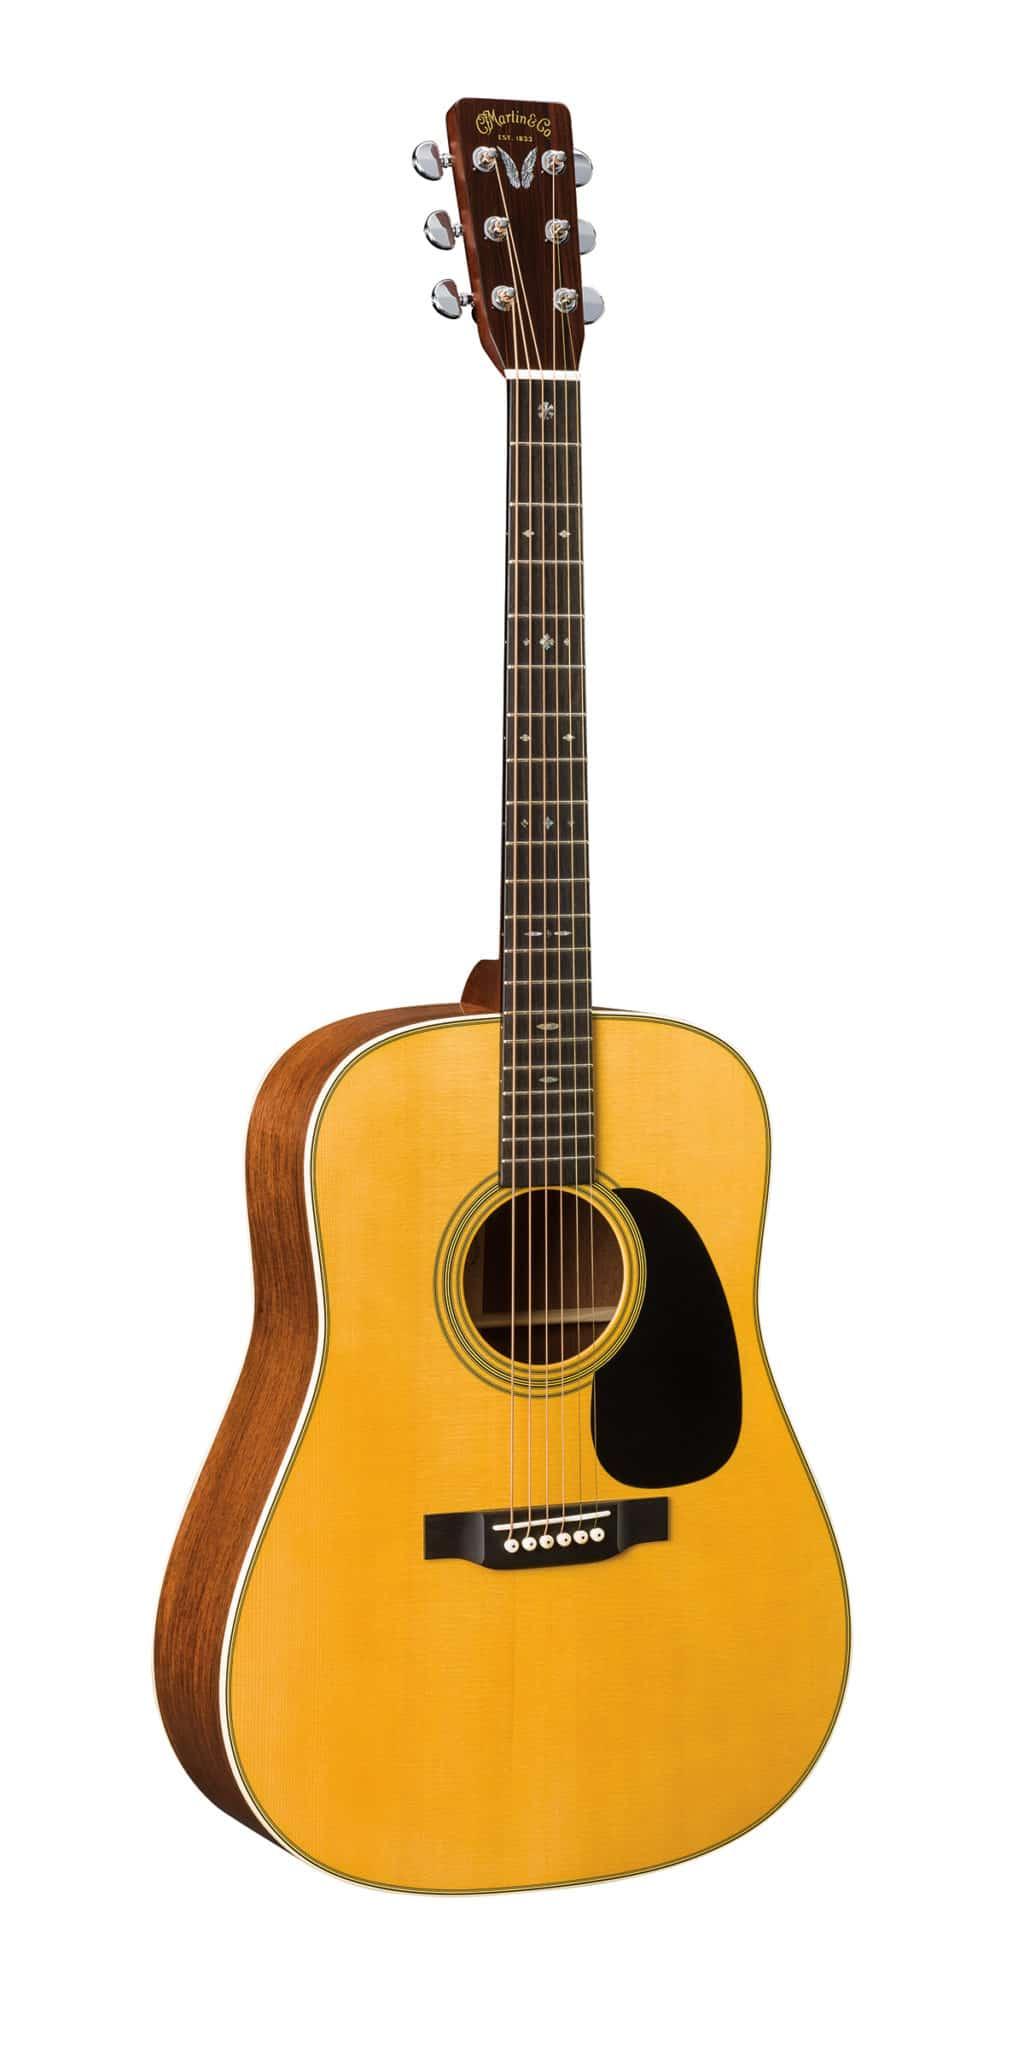 Vintage Martin Gitarren